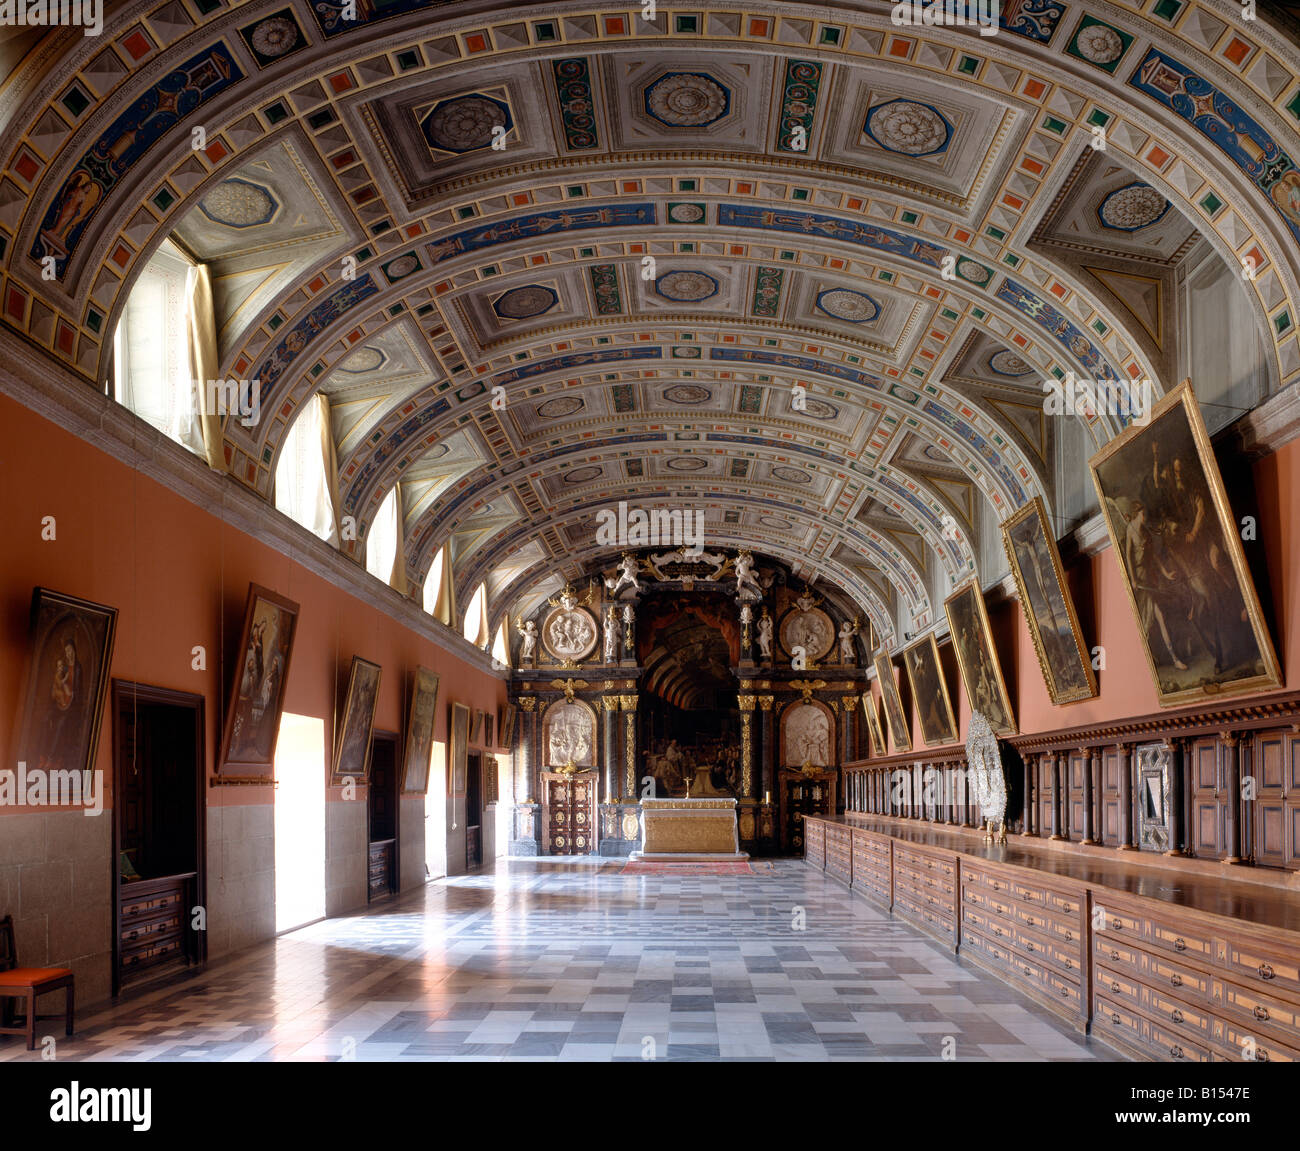 El Escorial Palacio Sacristia Sakristei Stock Photo